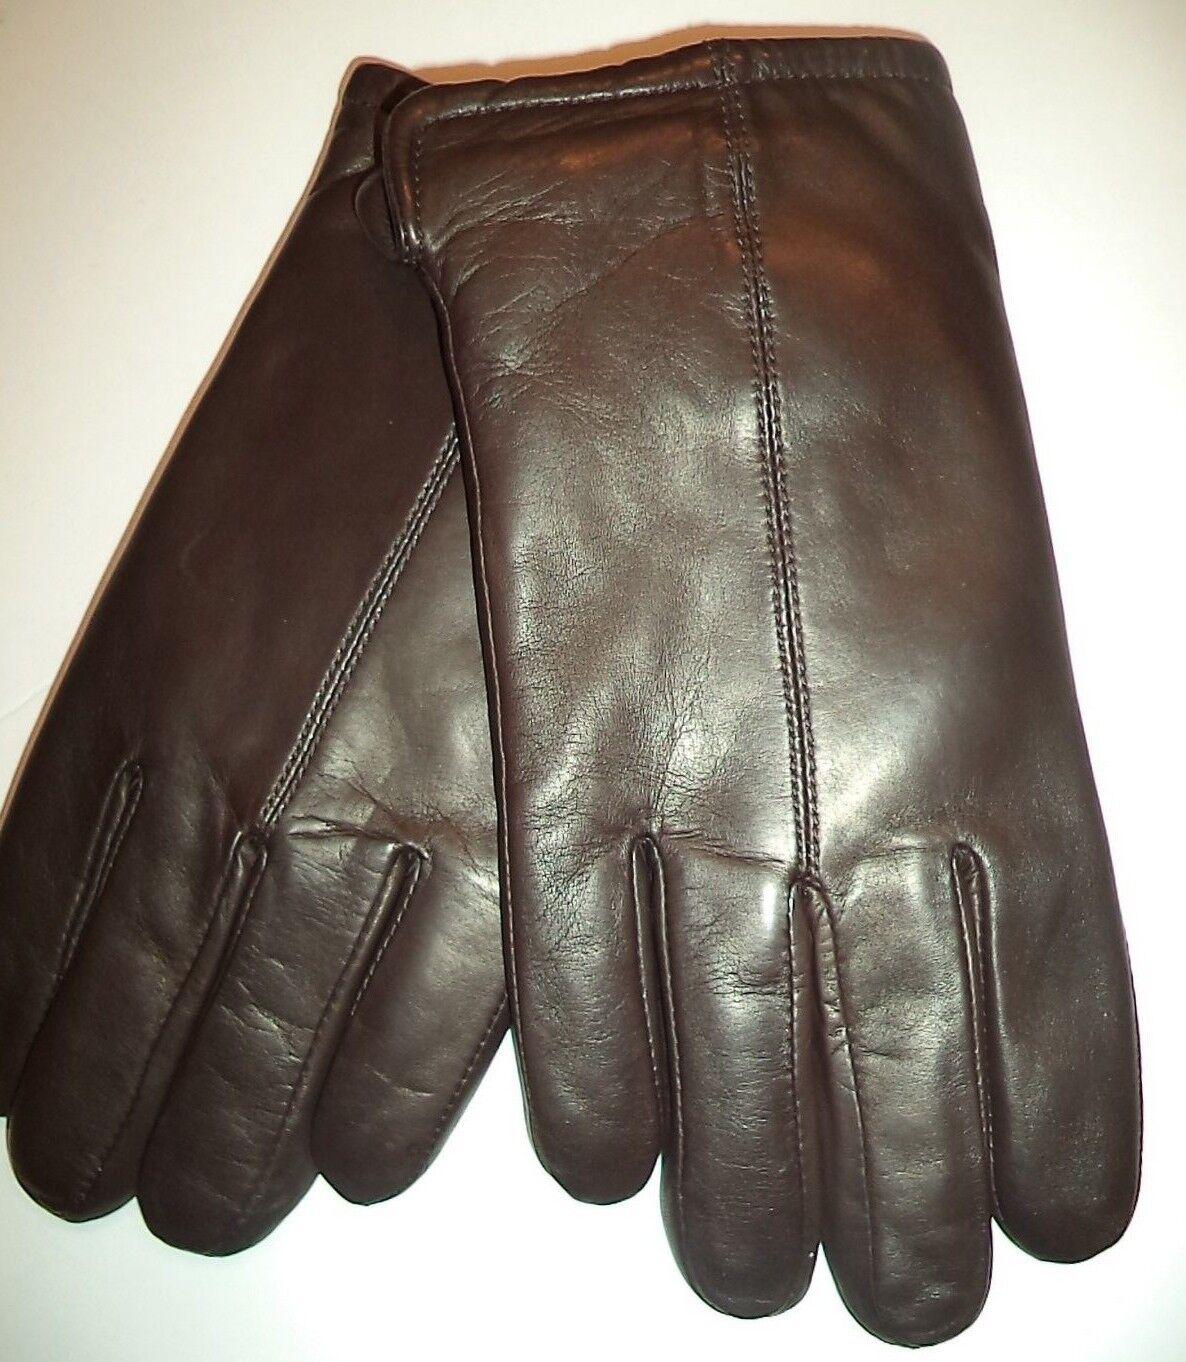 Grandoe Mens Leather Gloves,Brown, XL*